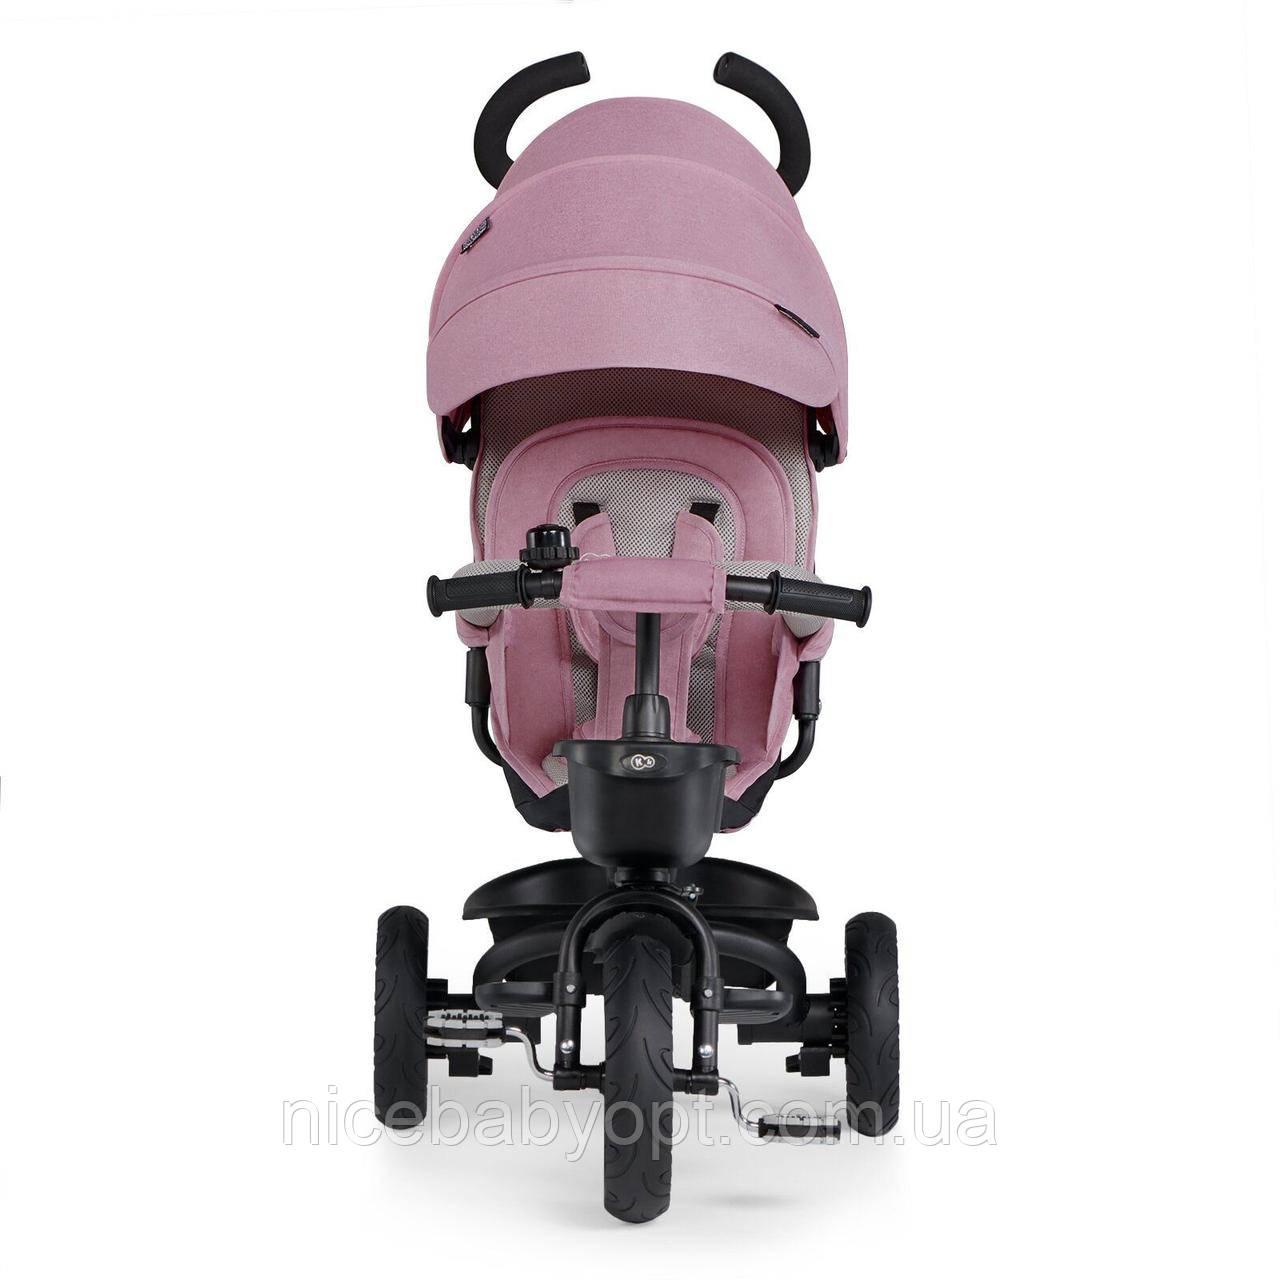 Триколісний велосипед Kinderkraft Spinstep Mauvelous Pink